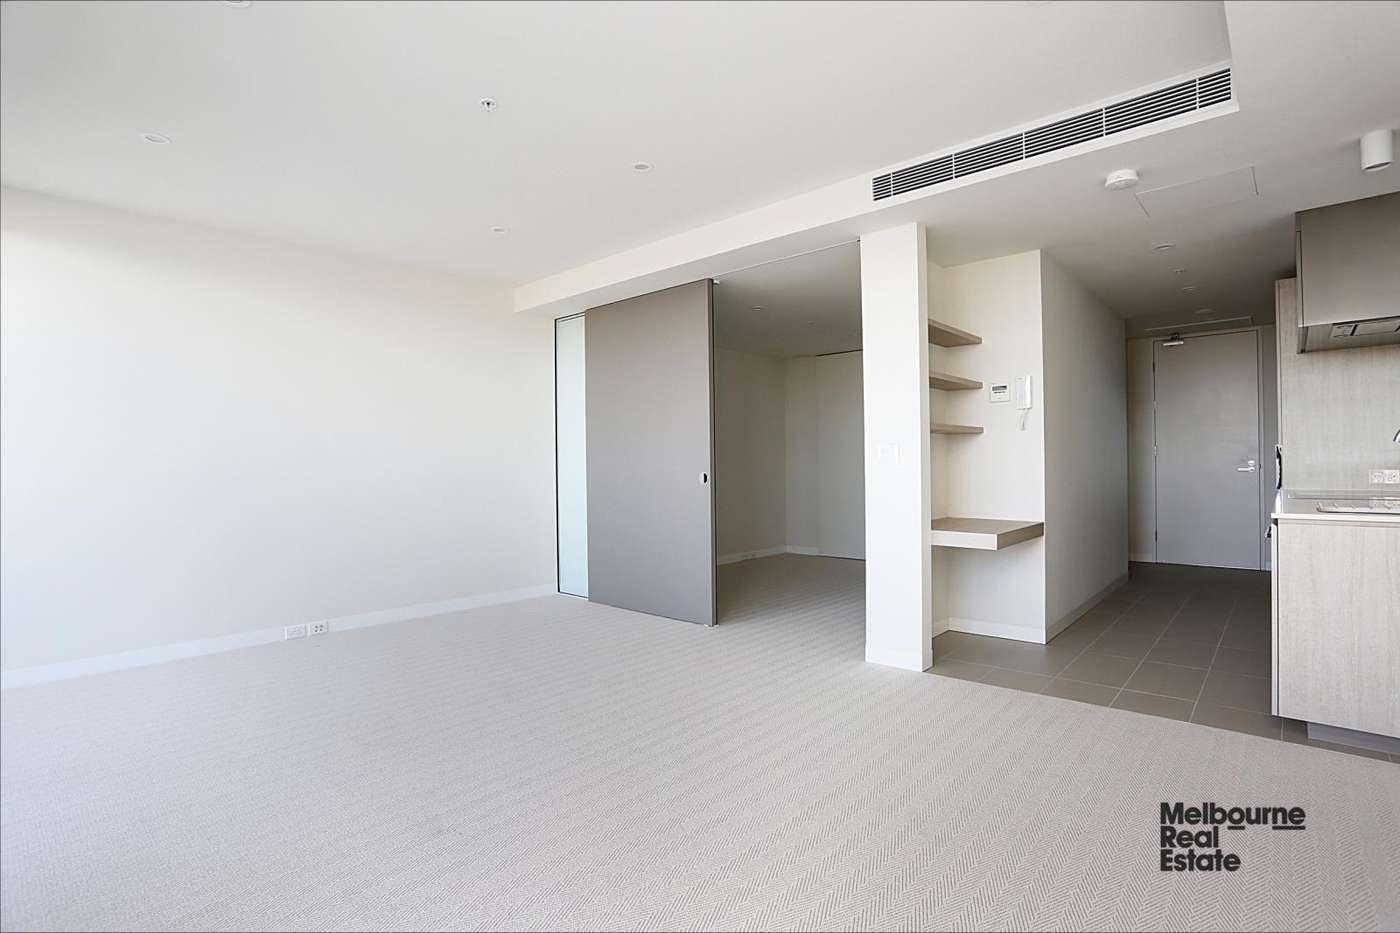 Main view of Homely apartment listing, 712/72 Wests Road, Maribyrnong, VIC 3032